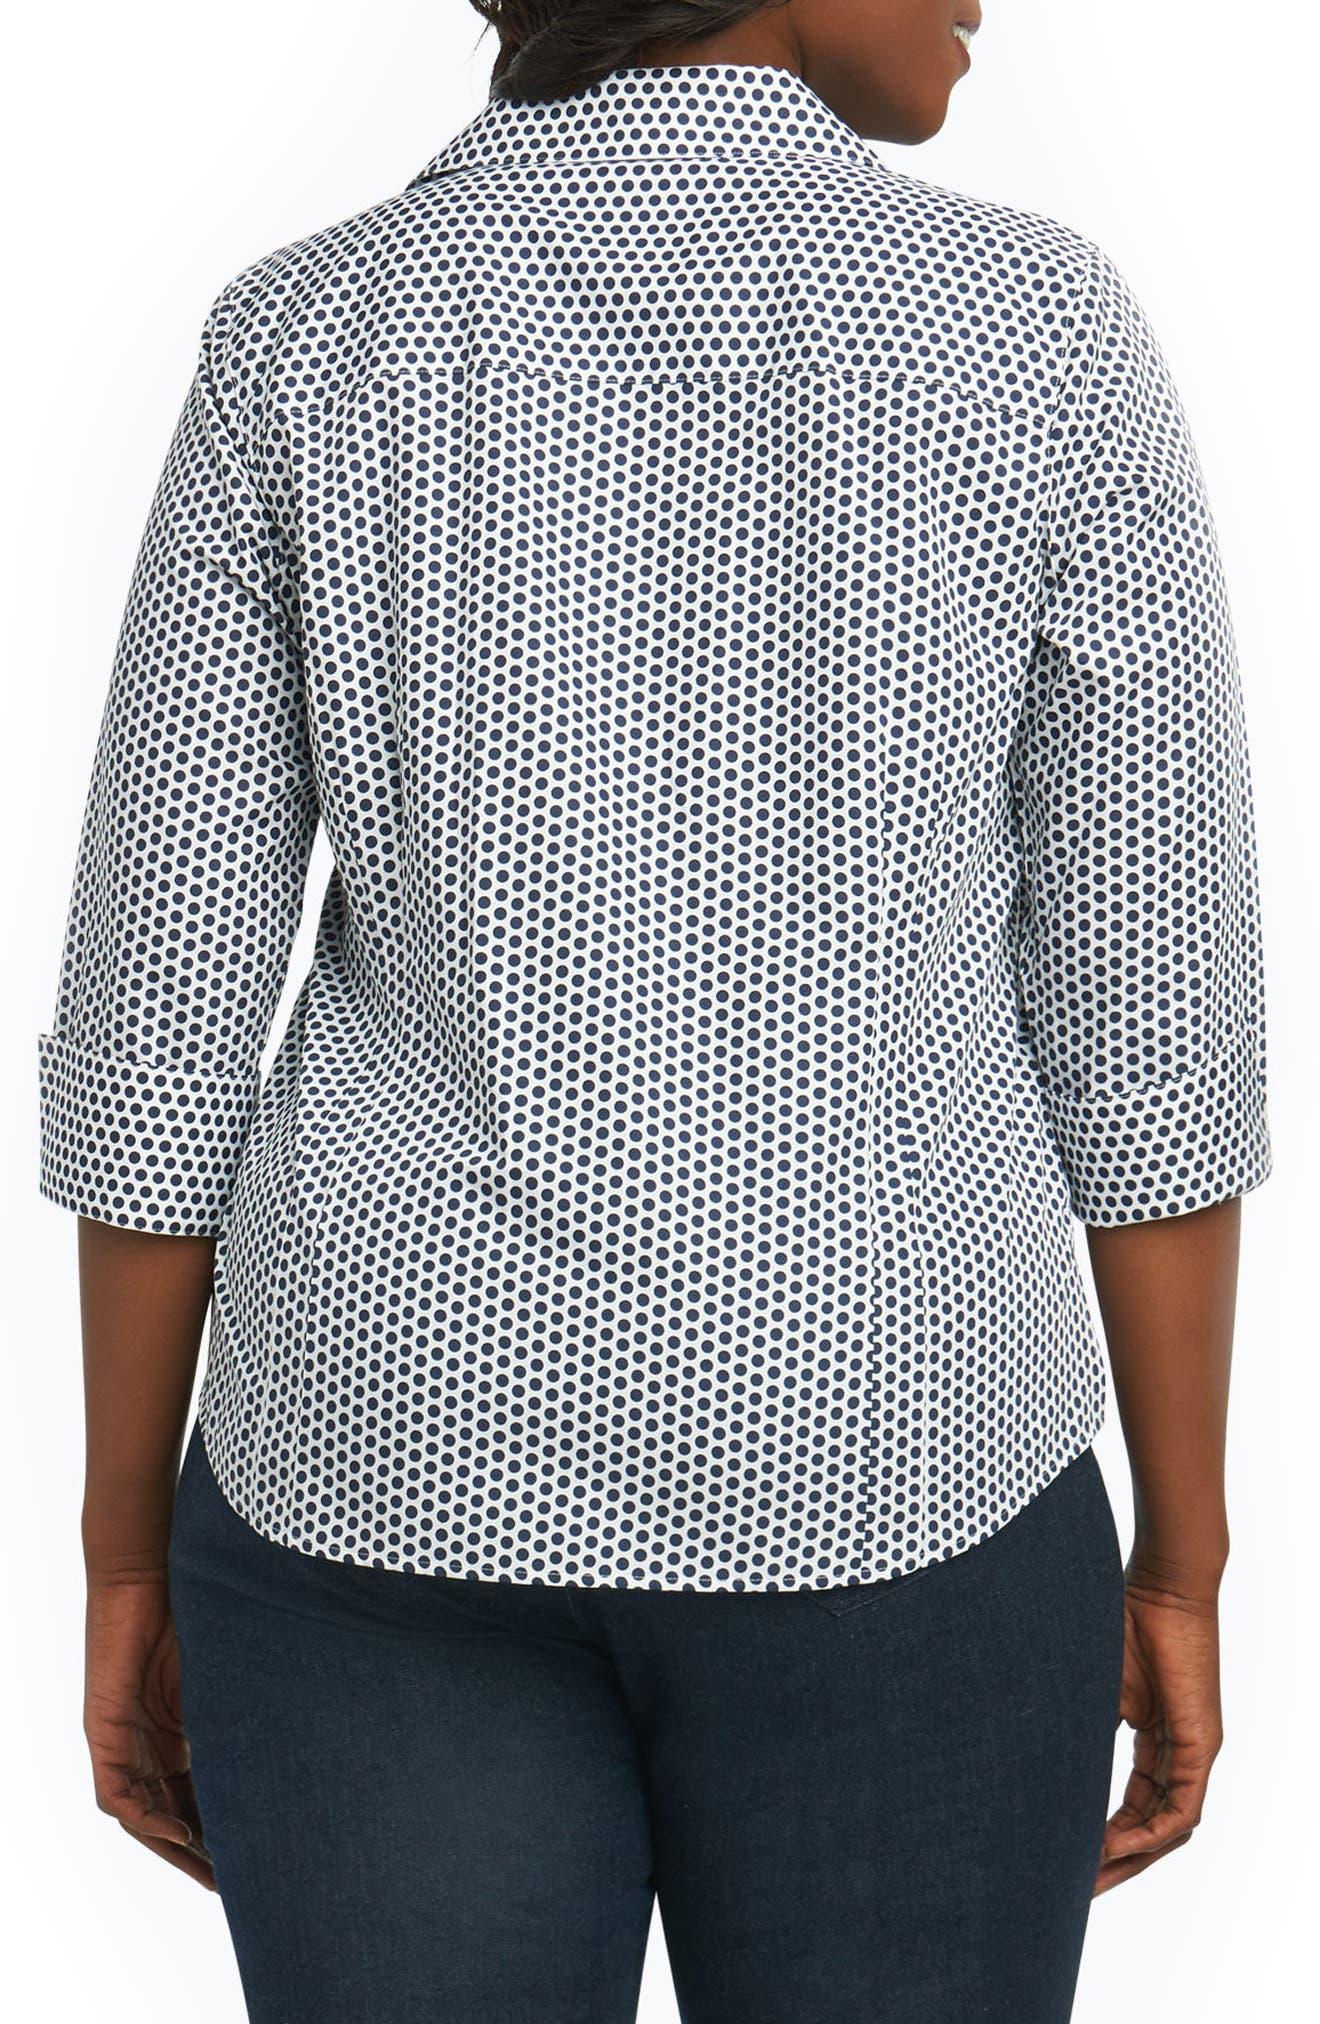 Taylor Optic Dot Non Iron Cotton Shirt,                             Alternate thumbnail 2, color,                             104